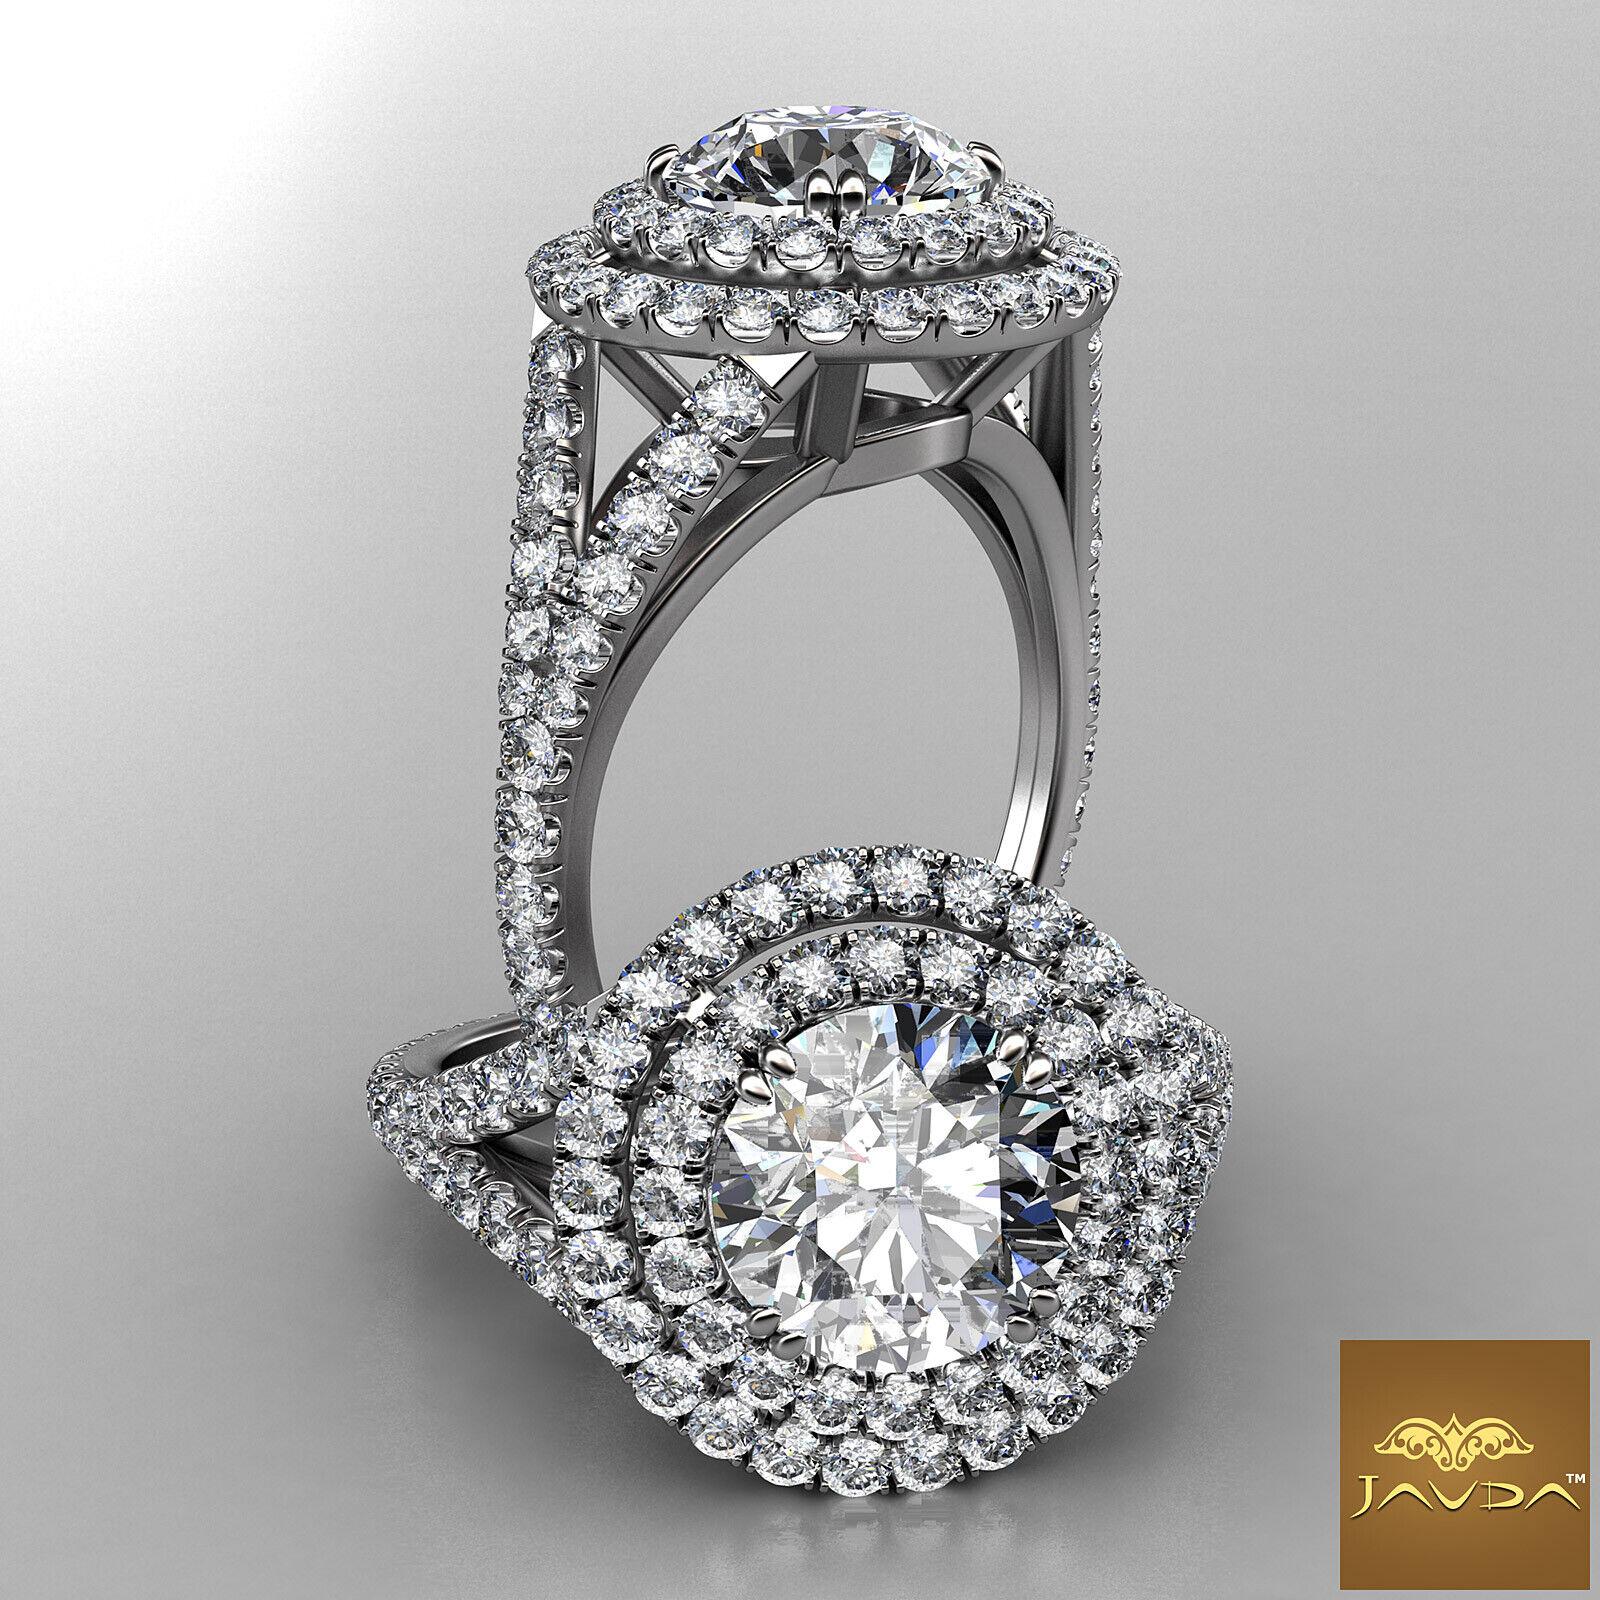 2.8ctw Double Halo Split Shank Round Diamond  Engagement Ring GIA E-VVS1 w Gold